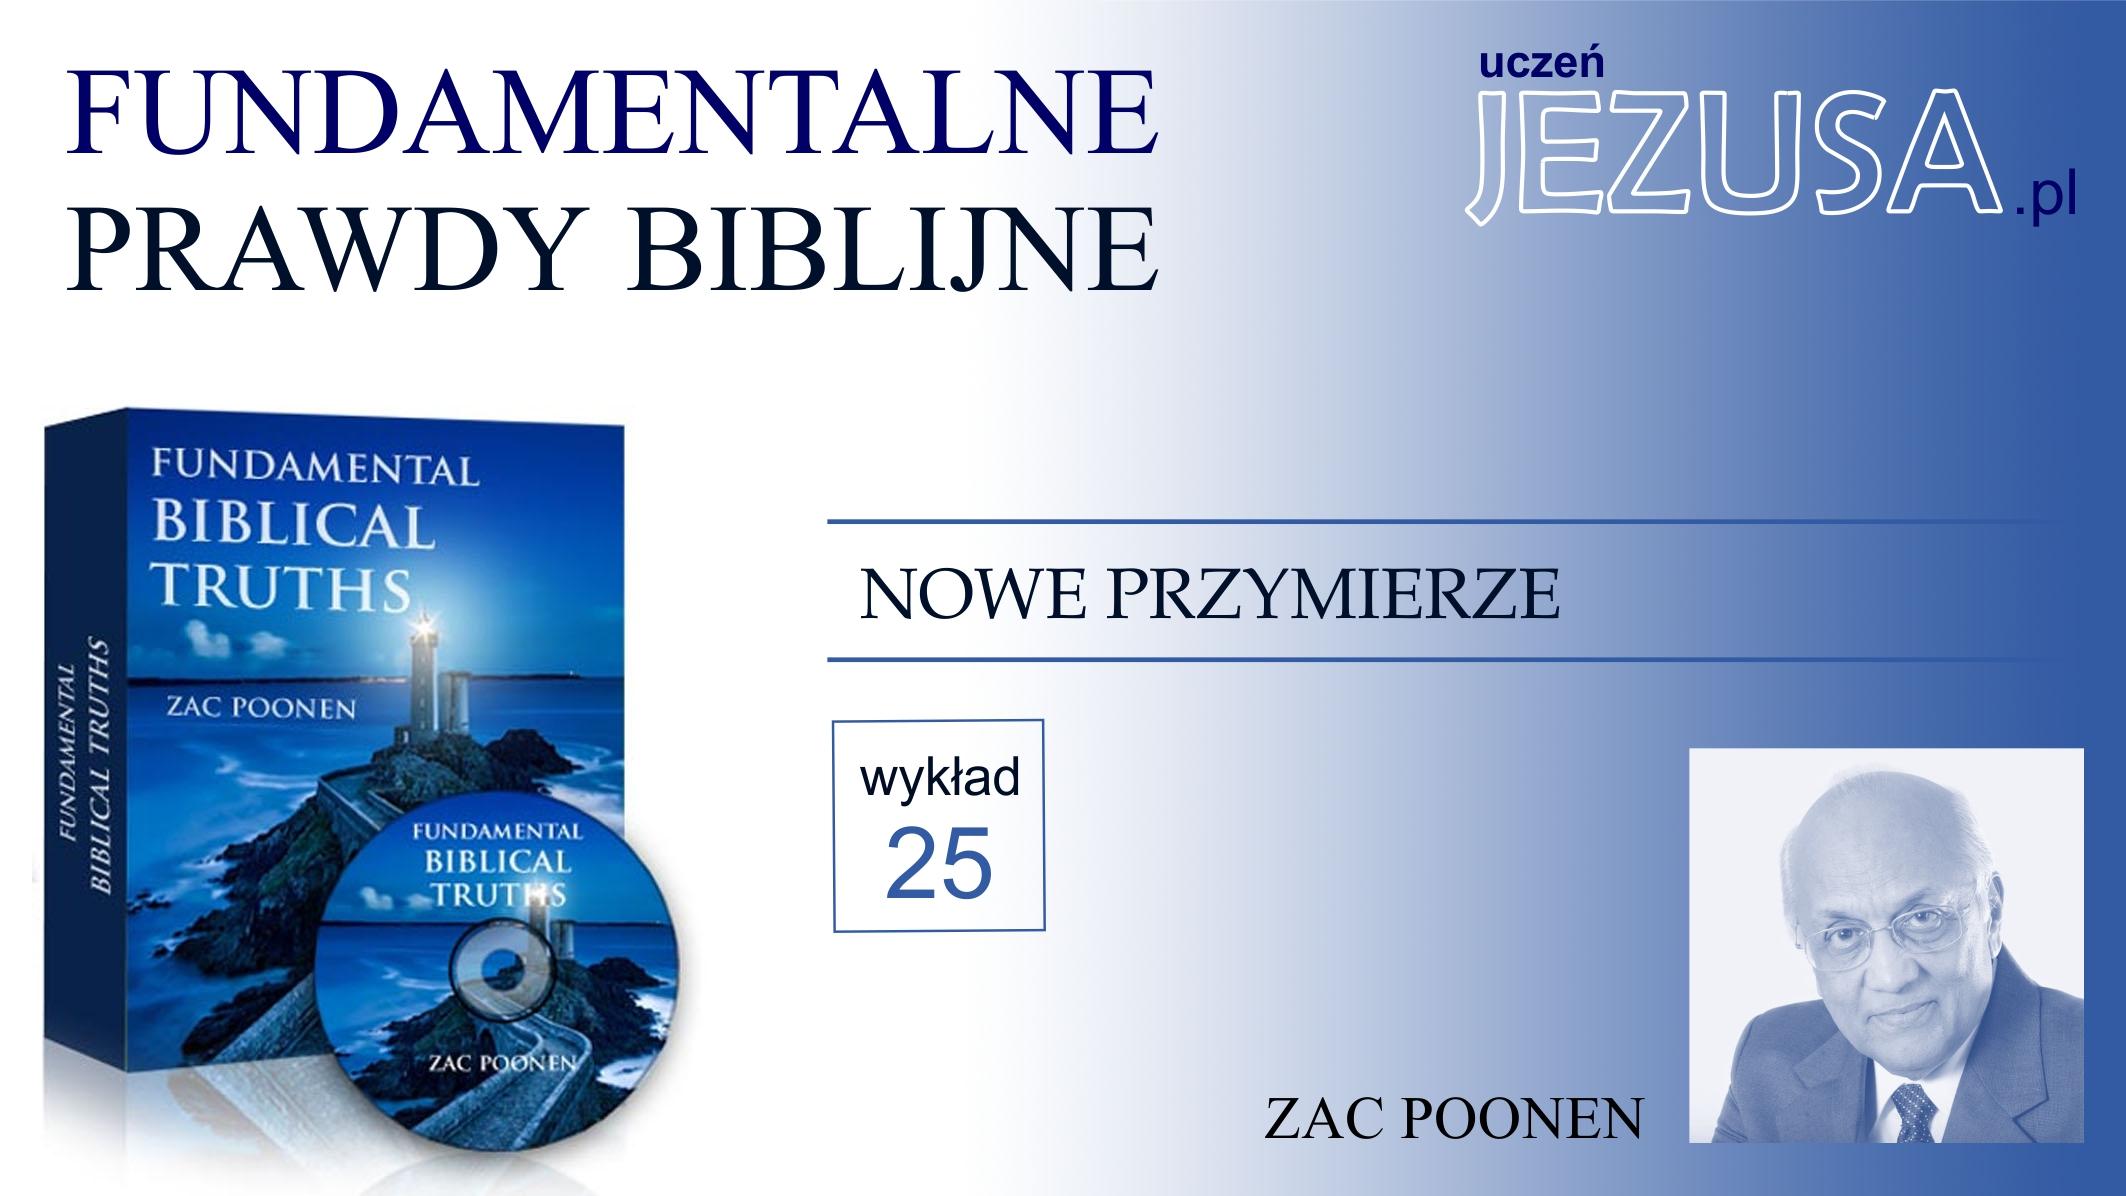 NOWE PRZYMIERZE – Zac Poonen